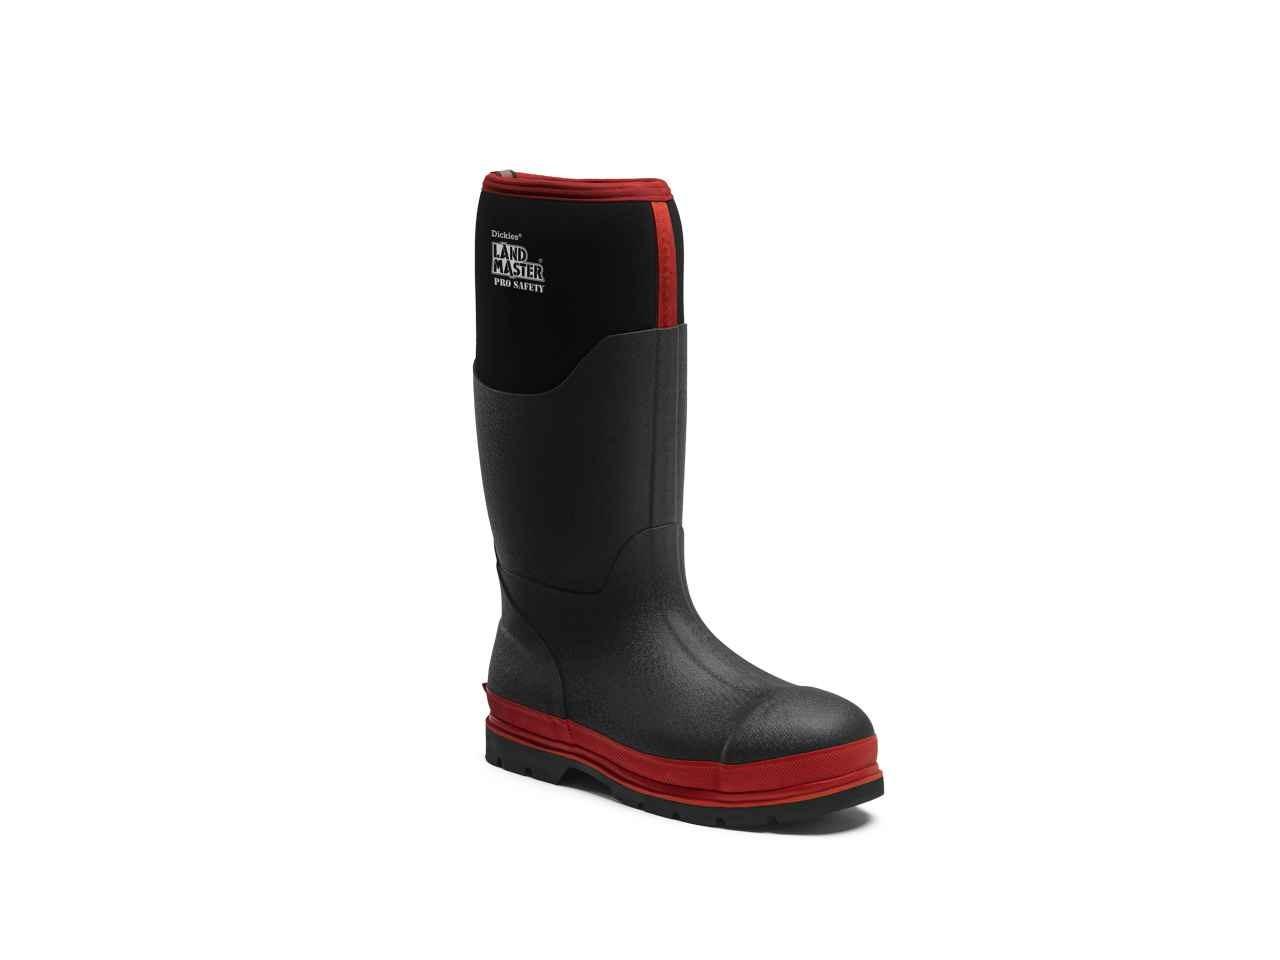 634d0f115b8 Dickies FW9902 Landmaster Pro Safety Wellington Black/Red Size 10